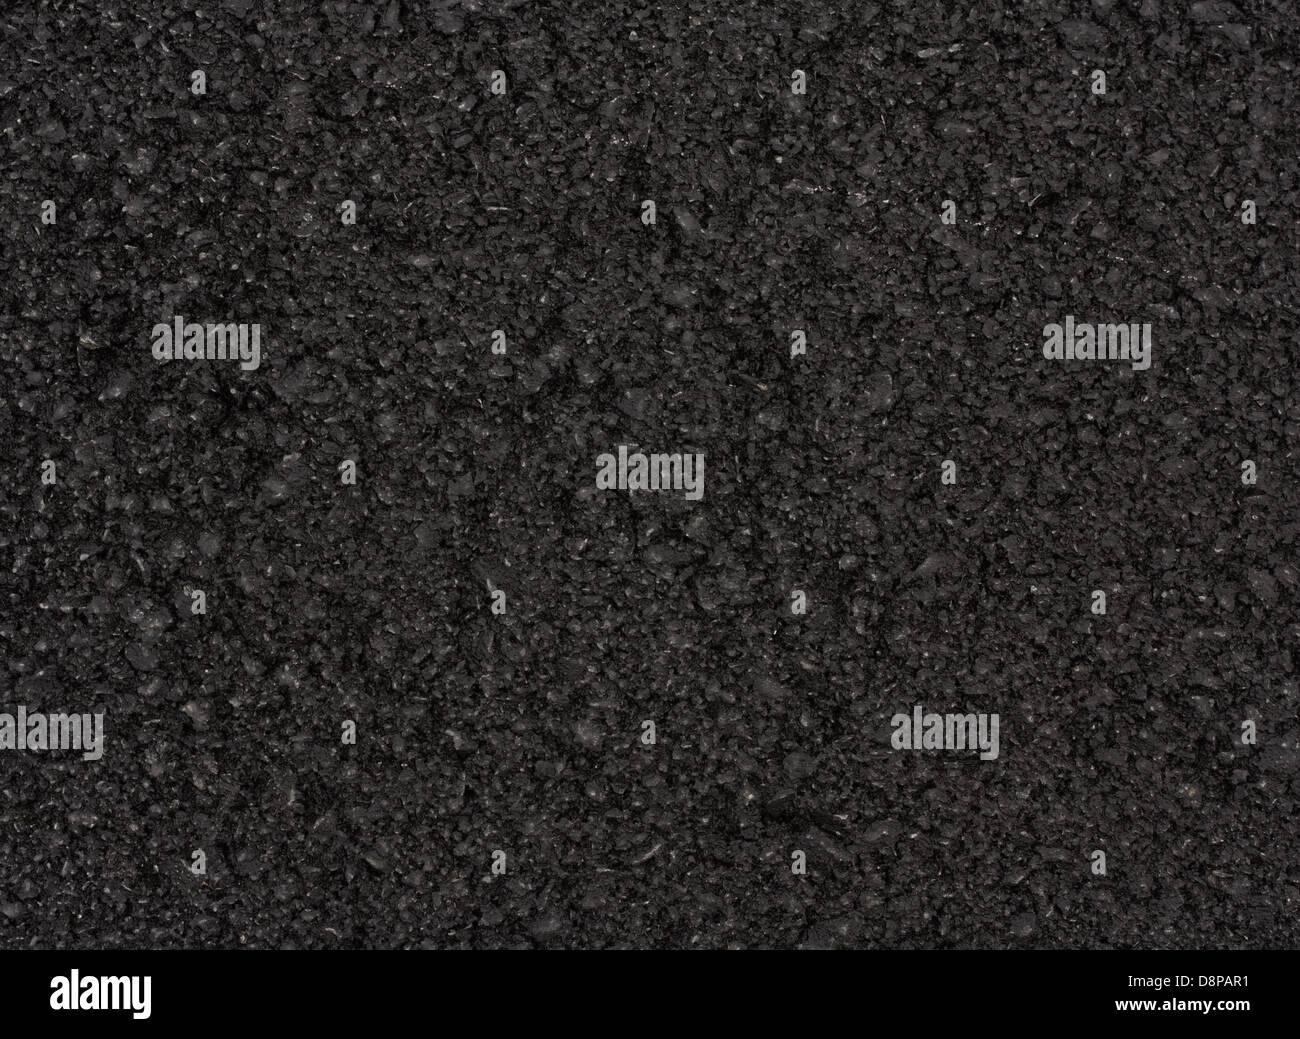 Freshly surfaced tarmac or asphalt road great background for resurfacing industry or motor sport - Stock Image